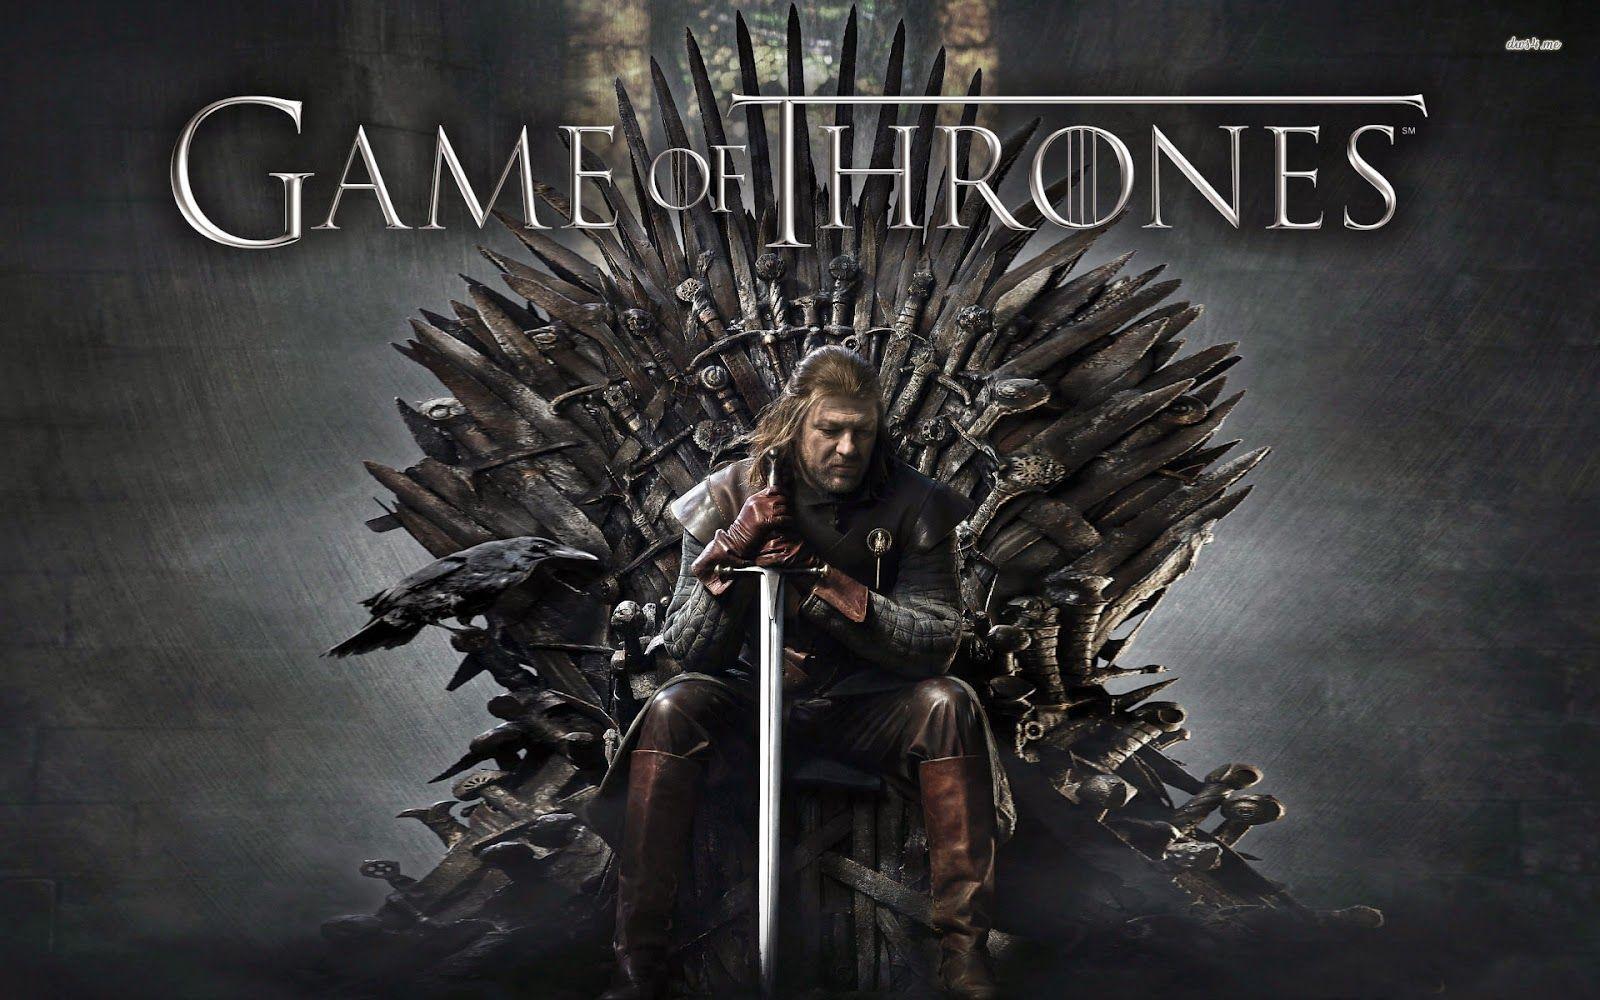 GAME OF THRONES Watch game of thrones, Game of thrones